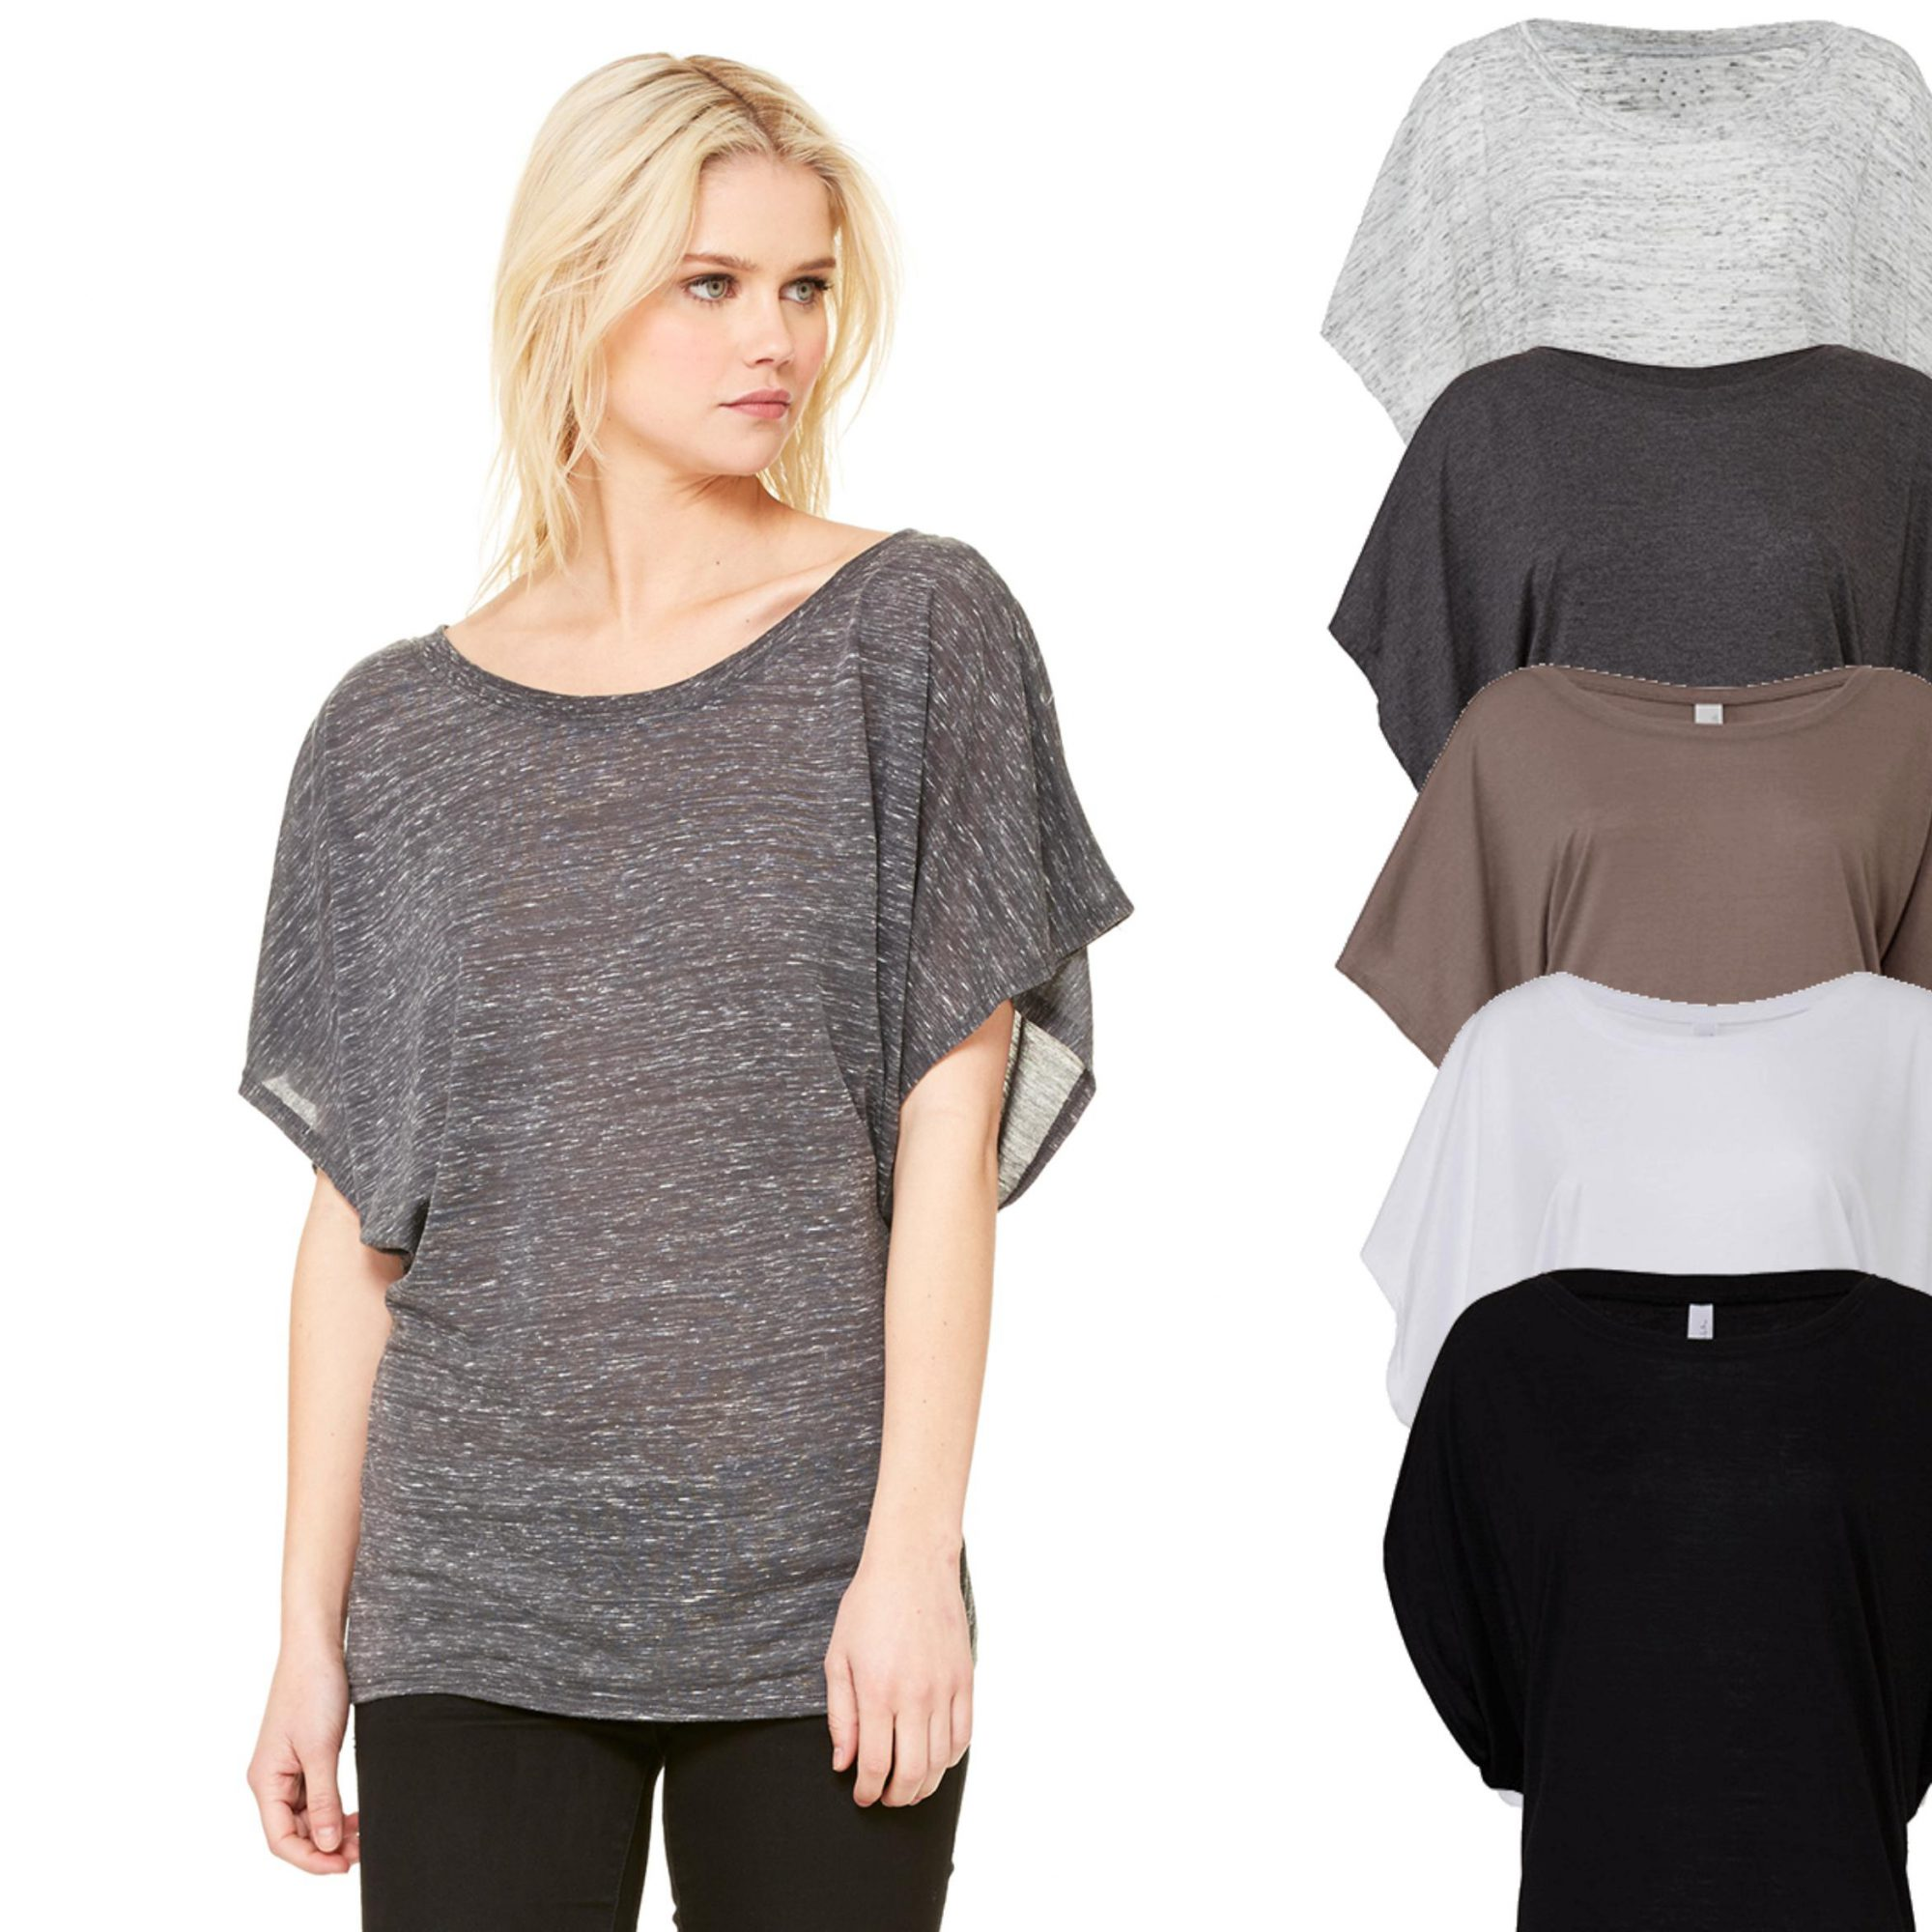 new styles 5f9e8 e8a76 Bella Longshirt Tunika mit Fledermausärmel